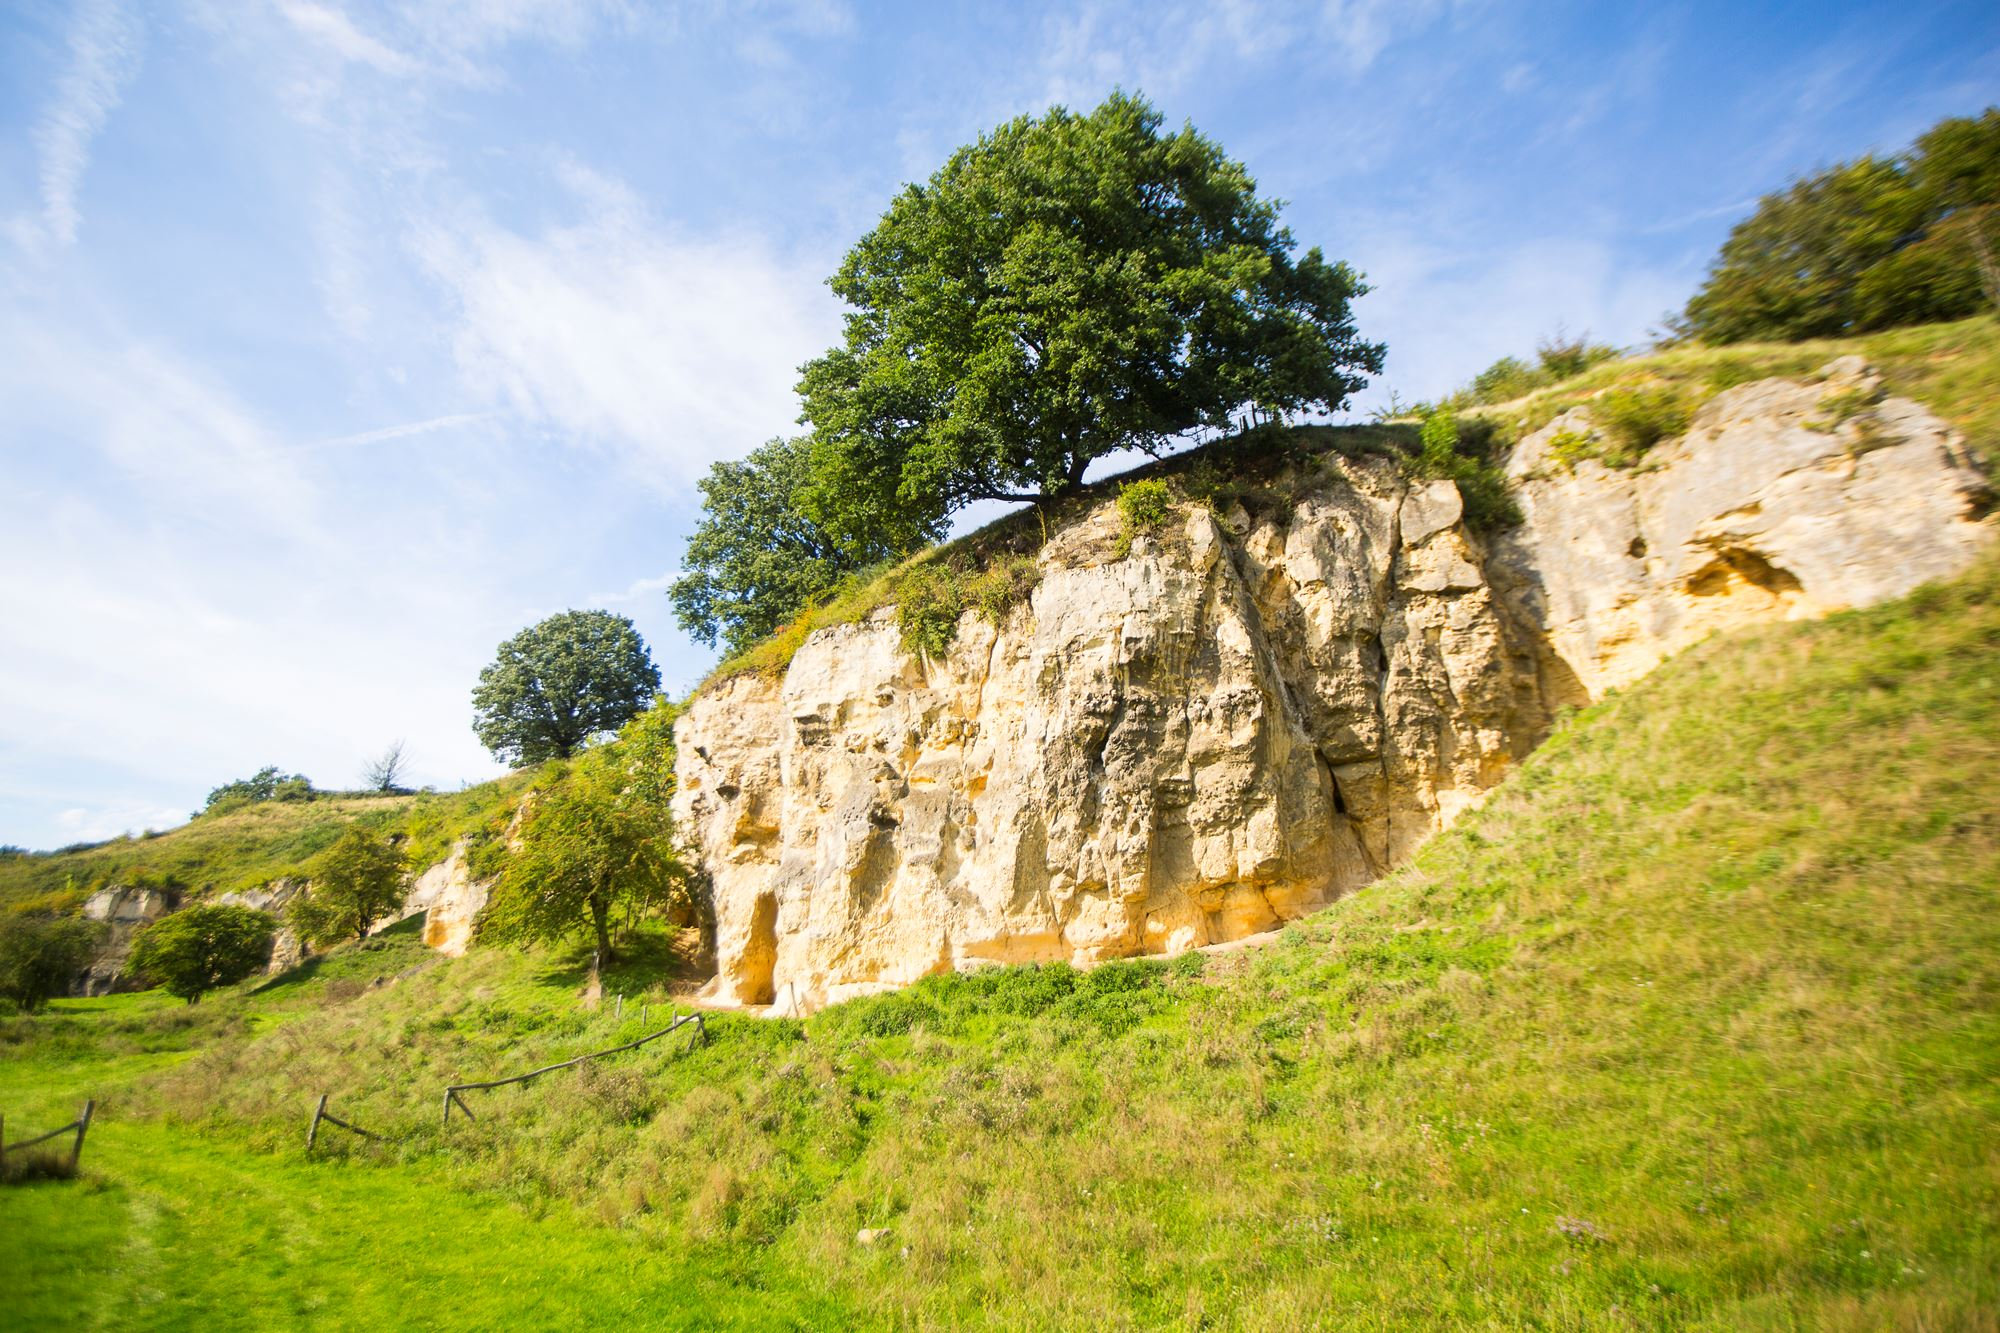 Mergelwand in Zuid-Limburg bij Schin op Geul